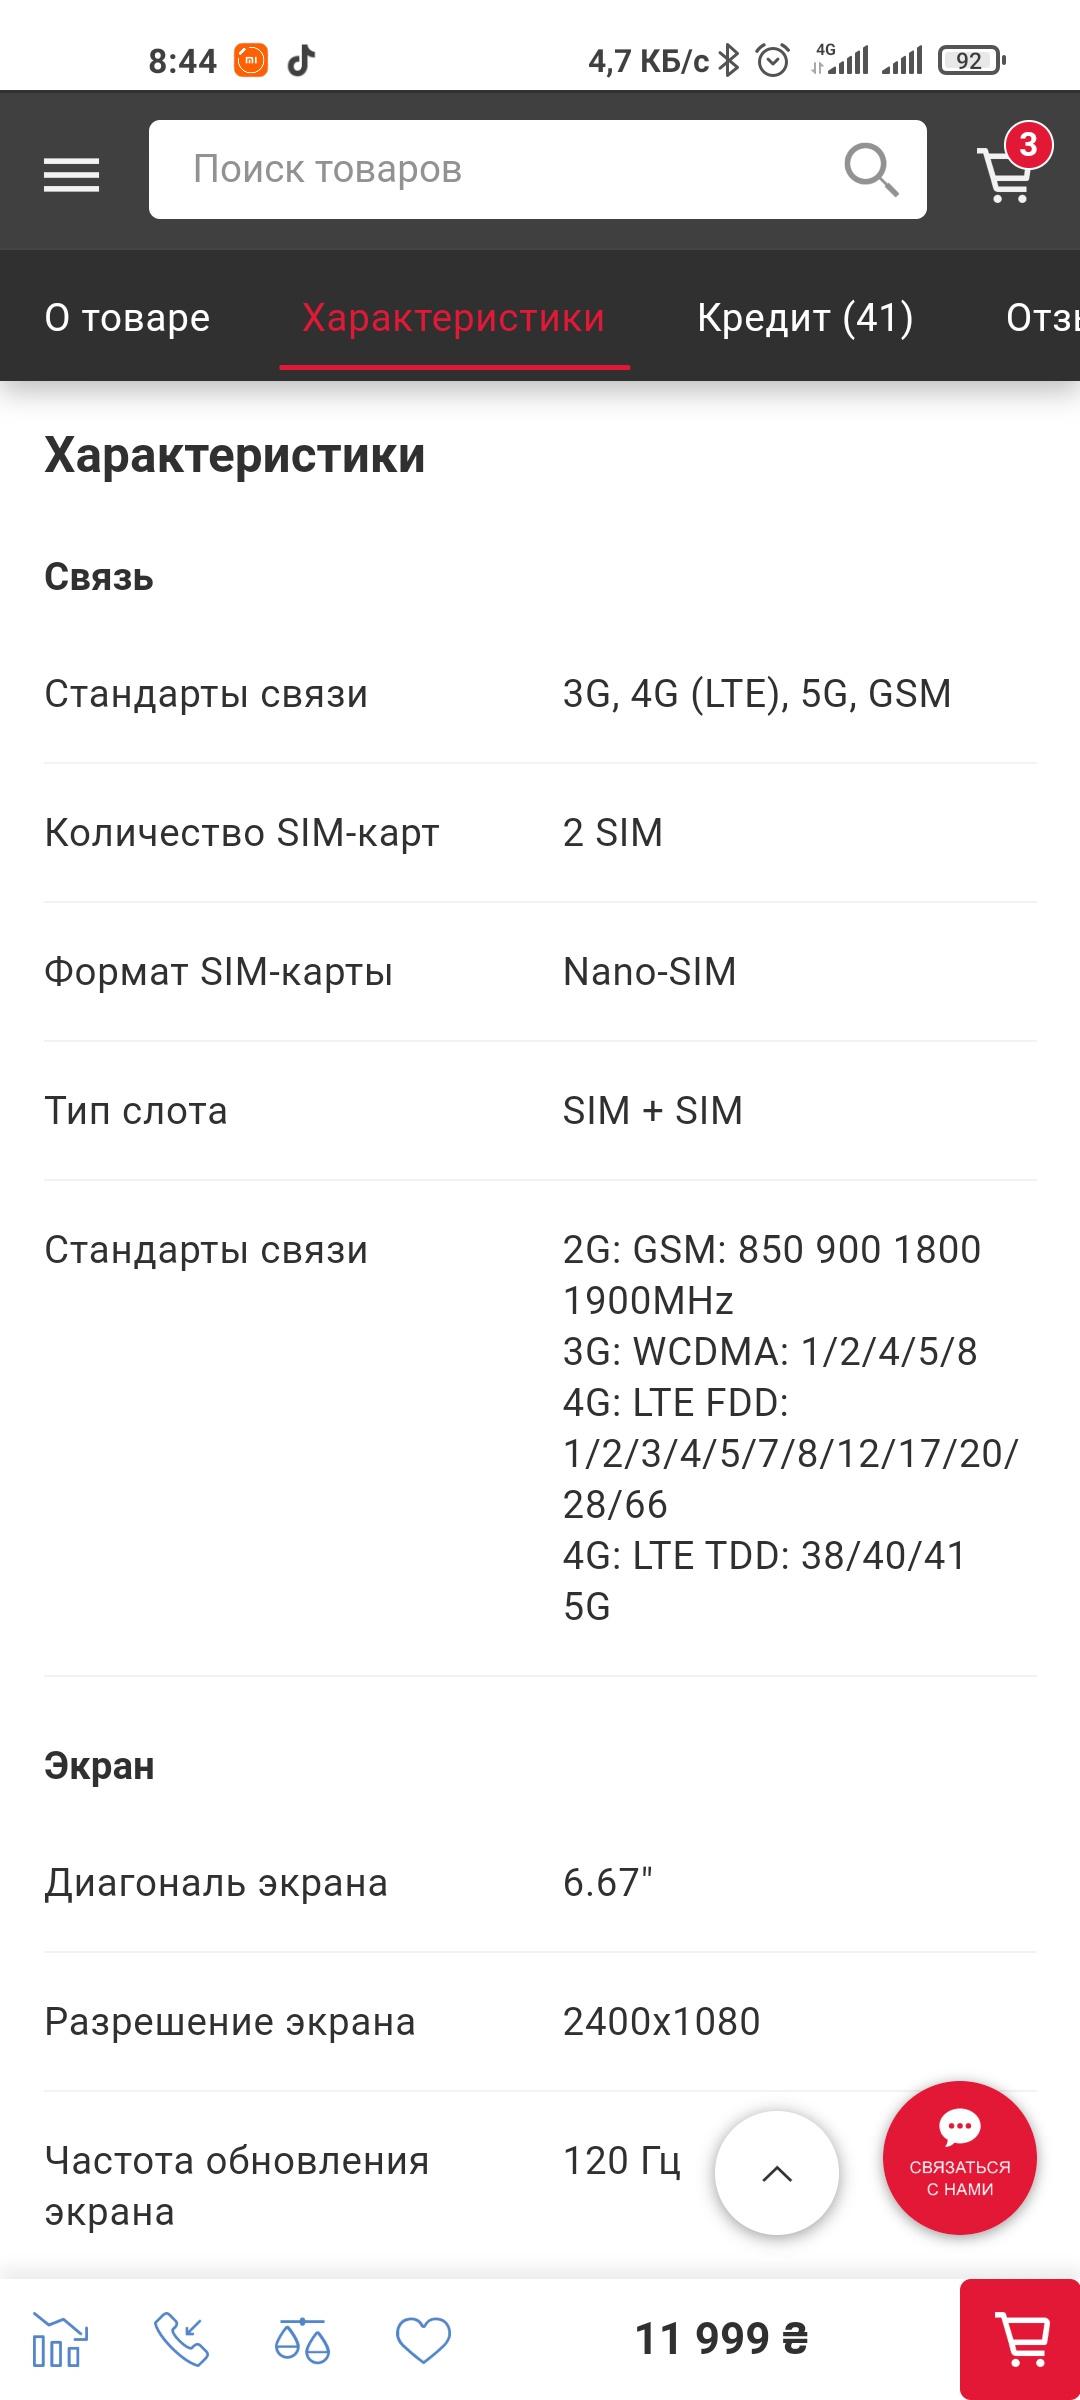 6098c8b15f154556782367.jpeg